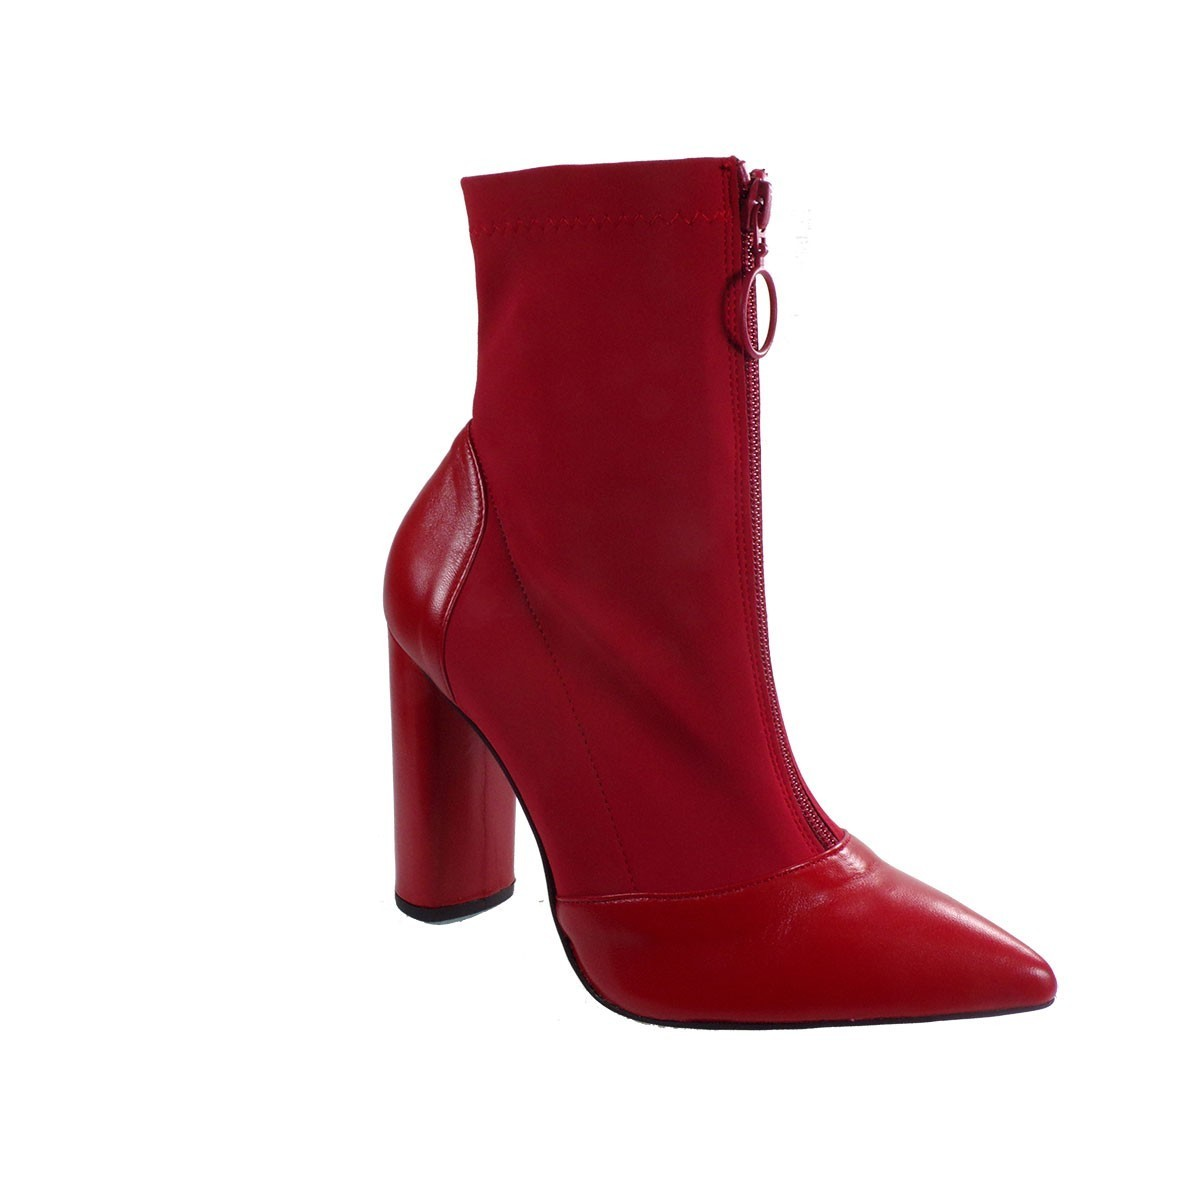 Fardoulis Shoes Γυναικεία Παπούτσια Μποτάκια 4713 Κόκκινο Λίκρα